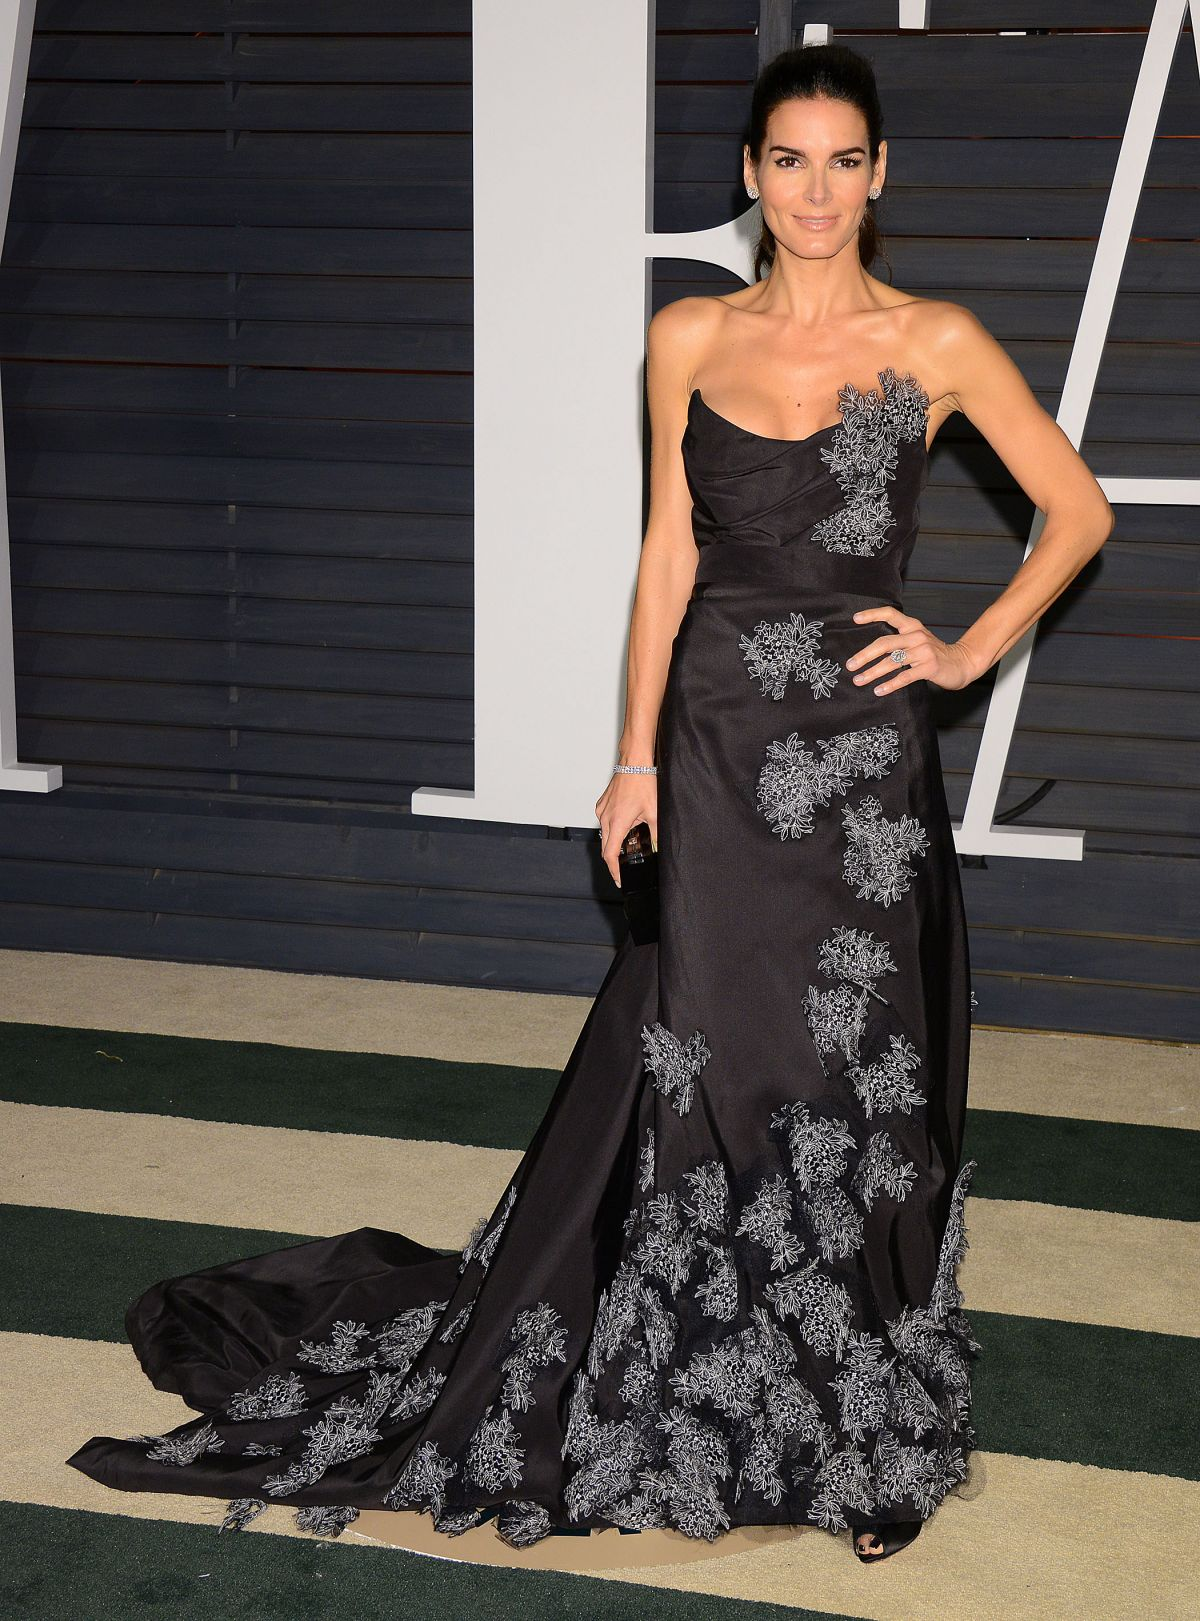 ANGIE HARMON at Vanity Fair Oscar Party in Hollywood